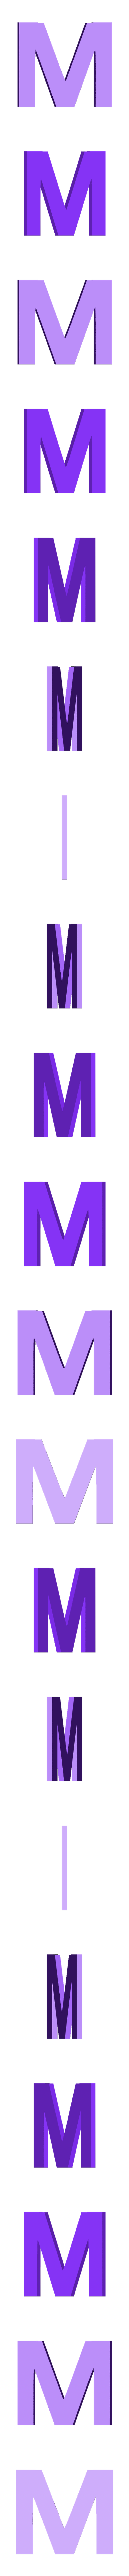 M.stl Download STL file BMW • 3D print template, GREGCAR_3DPrinting